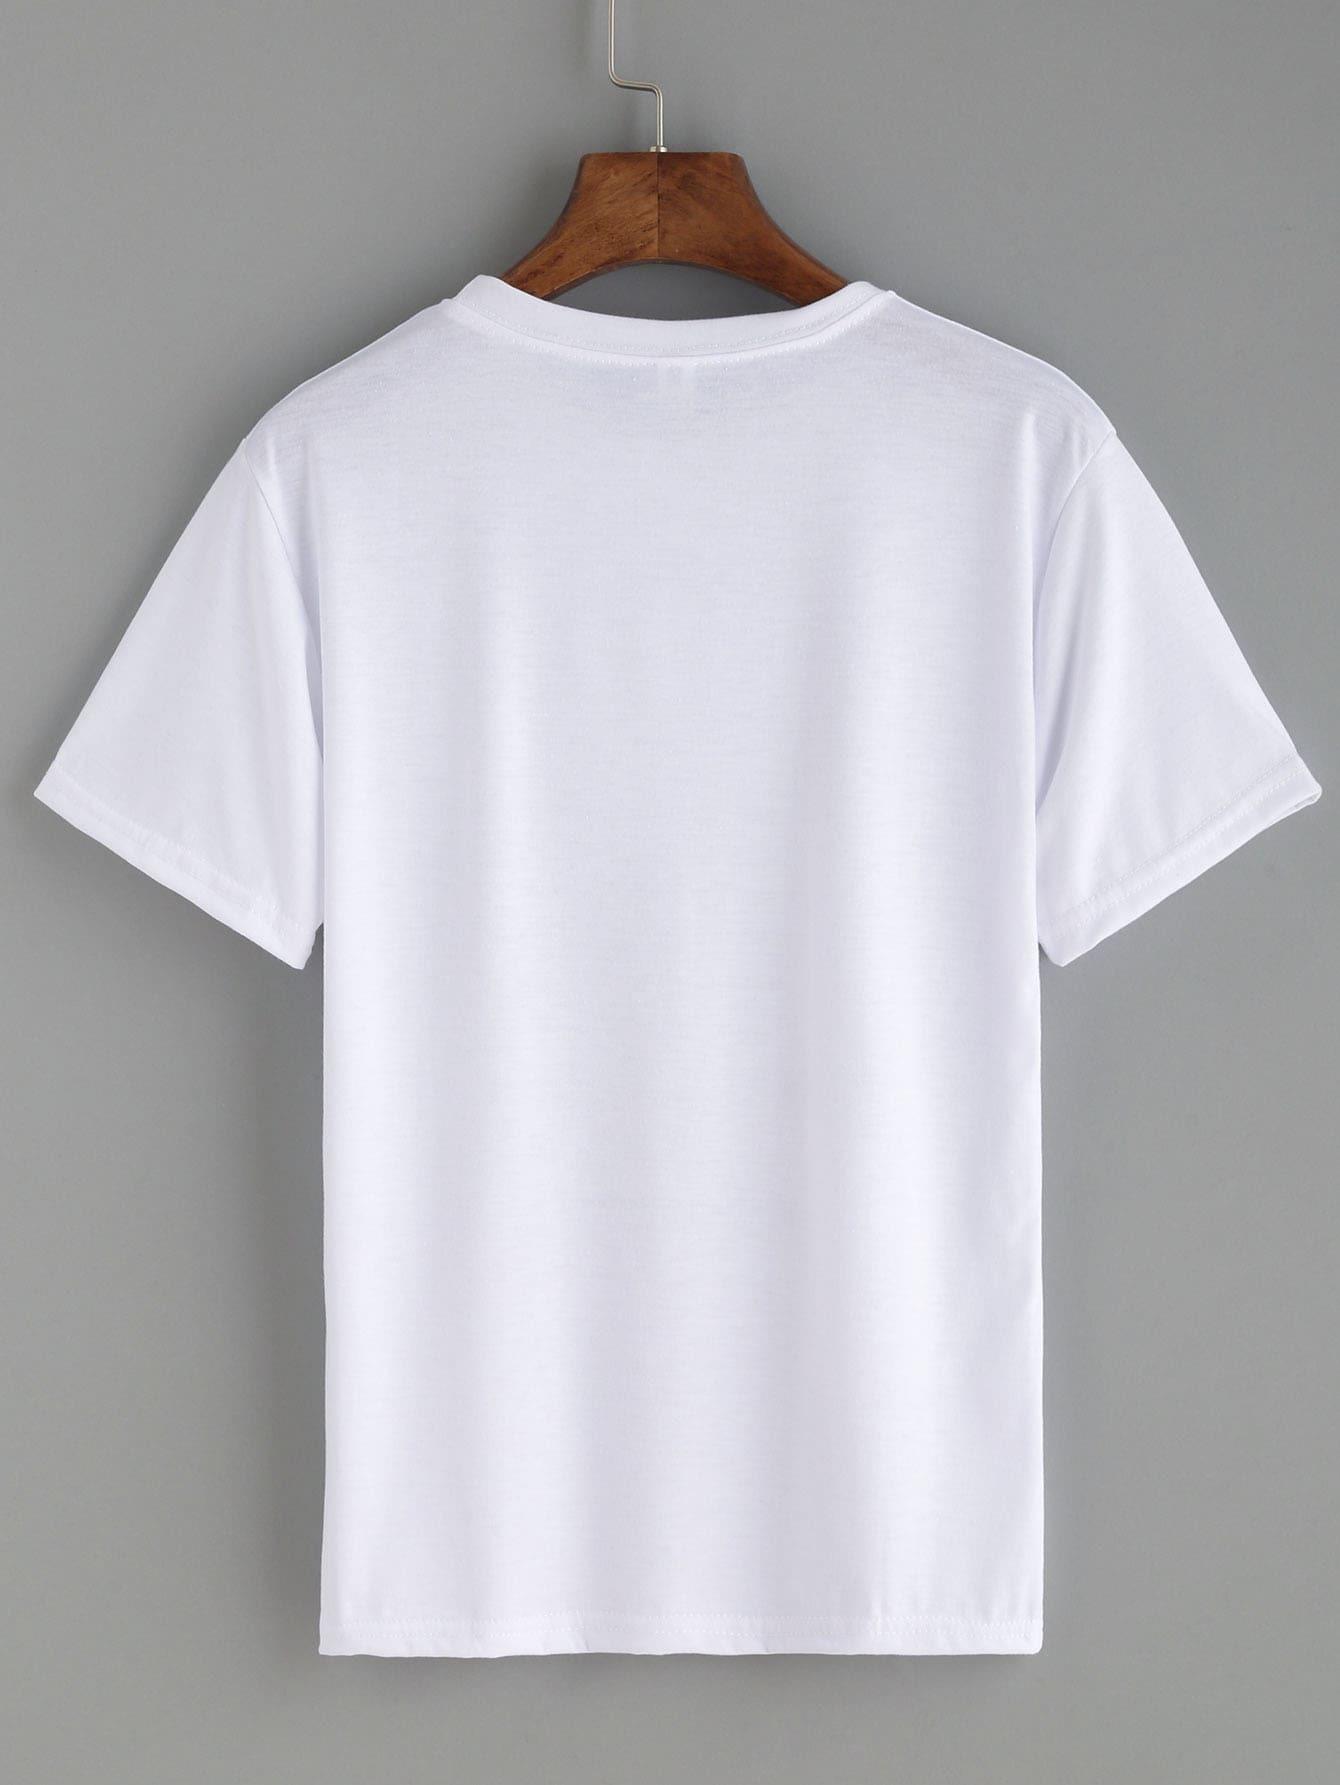 b2d0dcd48f White Hand Gesture Print T-shirt EmmaCloth-Women Fast Fashion Online